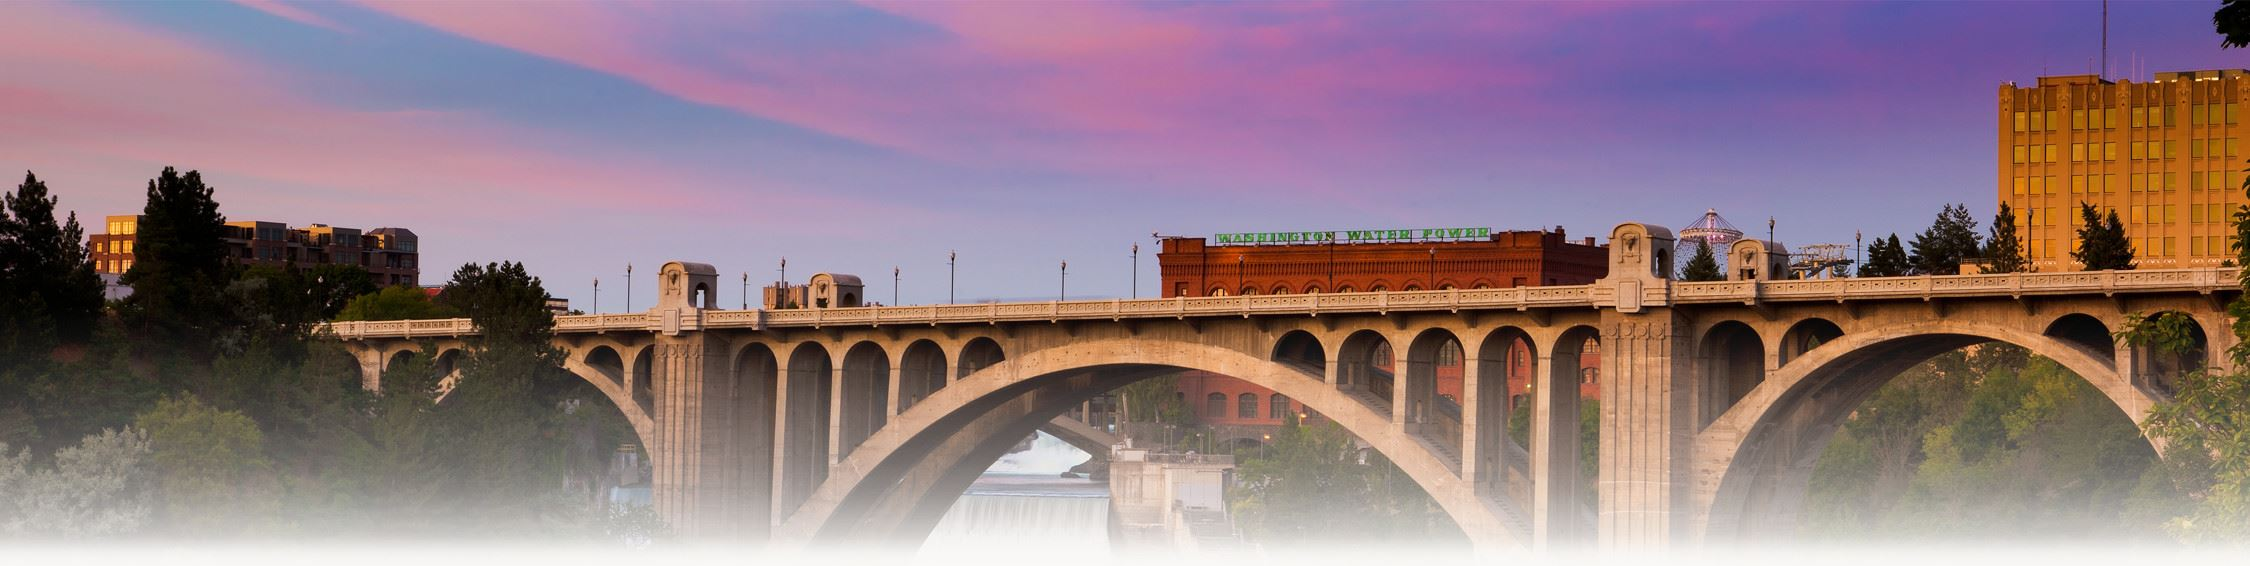 Traffic Ticket/Infraction Cases | Spokane County, WA